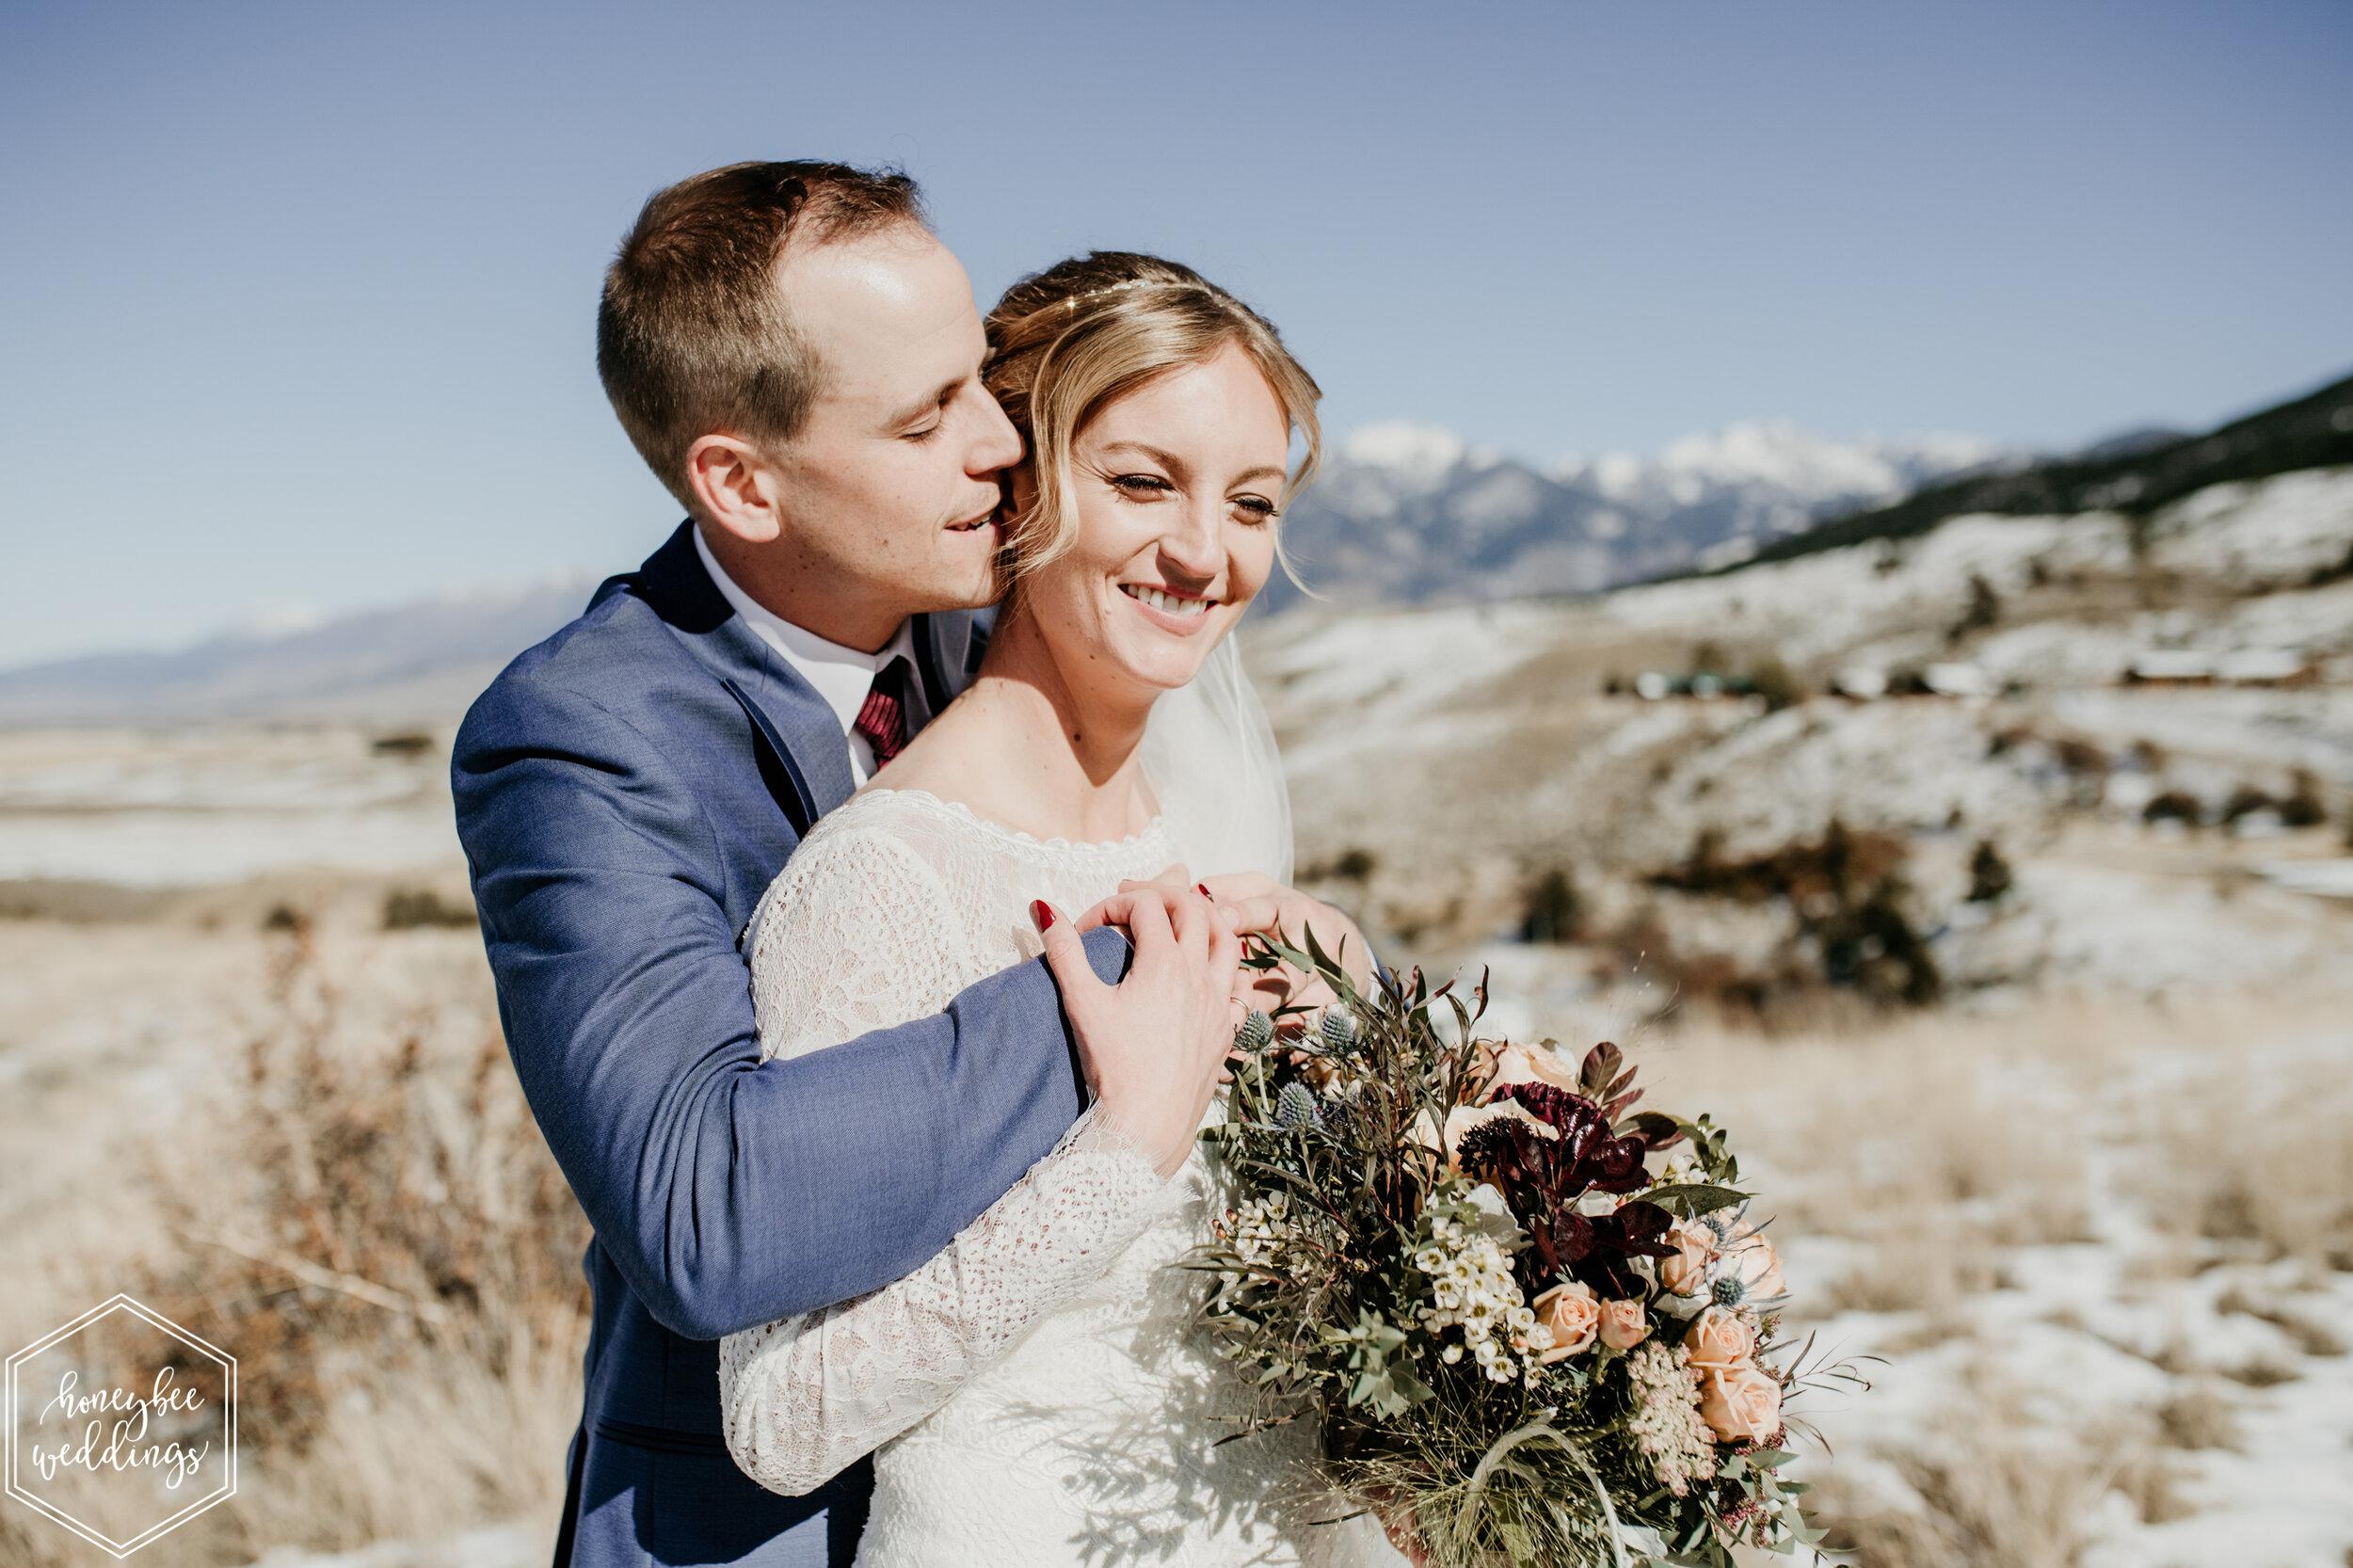 081Chico Hot Springs Wedding_Montana Wedding Photographer_Winter Wedding_Ariel & Richard_October 12, 2019-1248.jpg